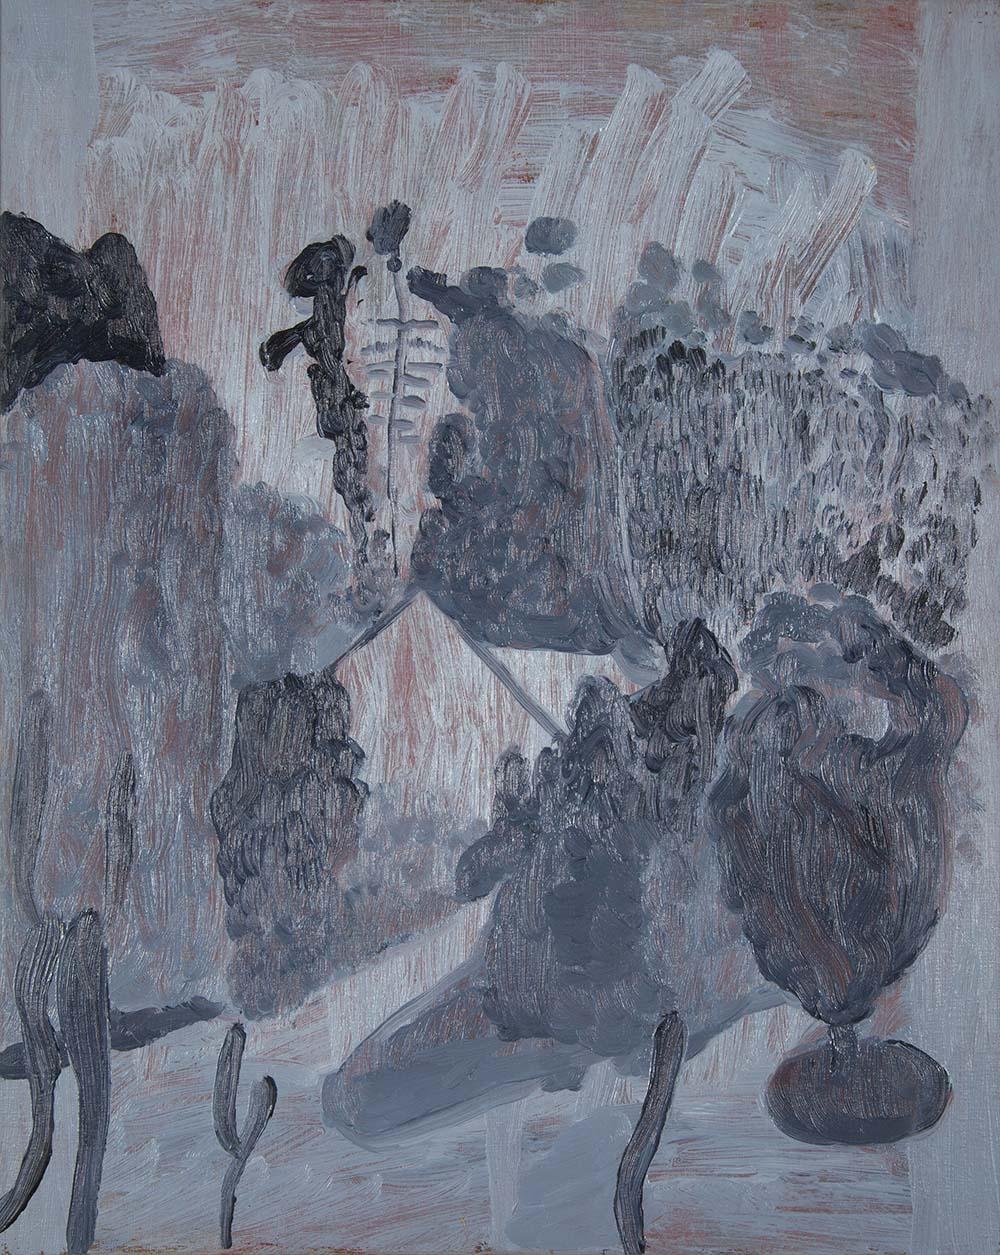 Sintra  oil on panel  2017  32 x 26cm